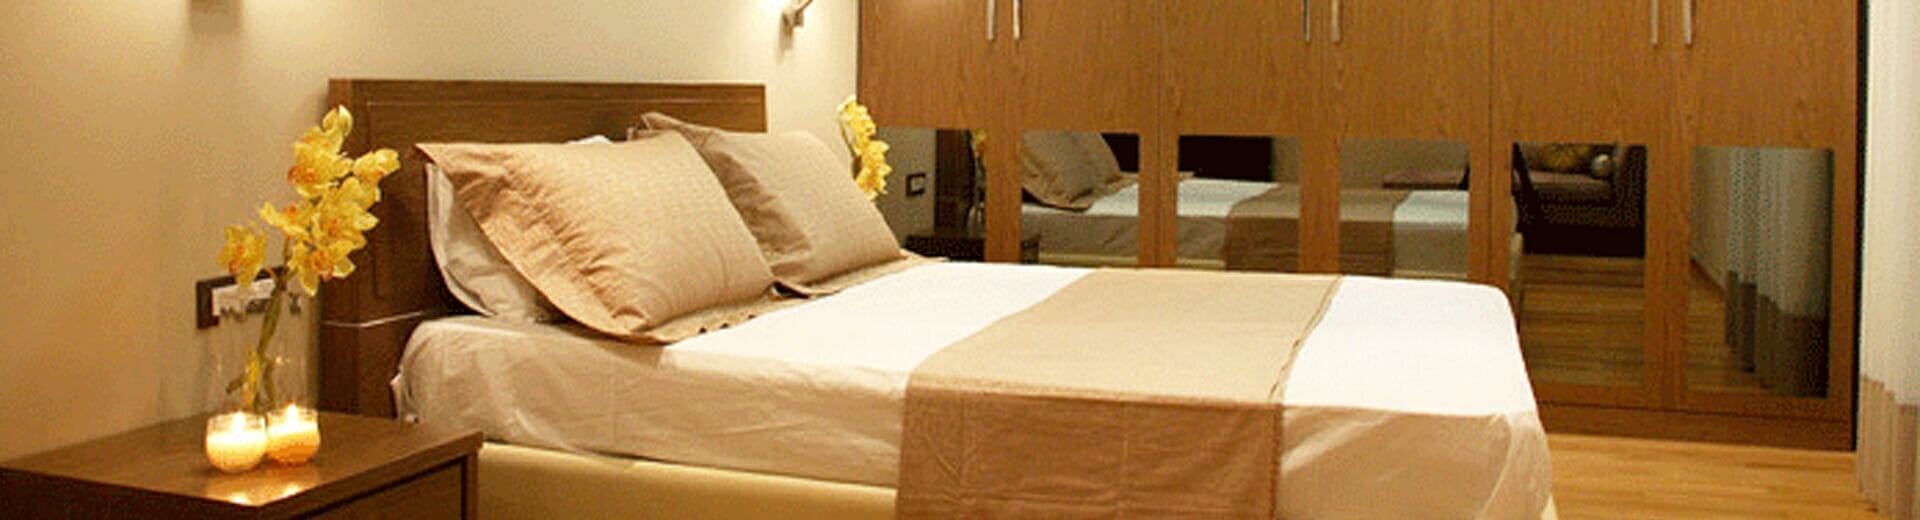 Bespoke Wardrobes & Bedroom Furniture Northeast